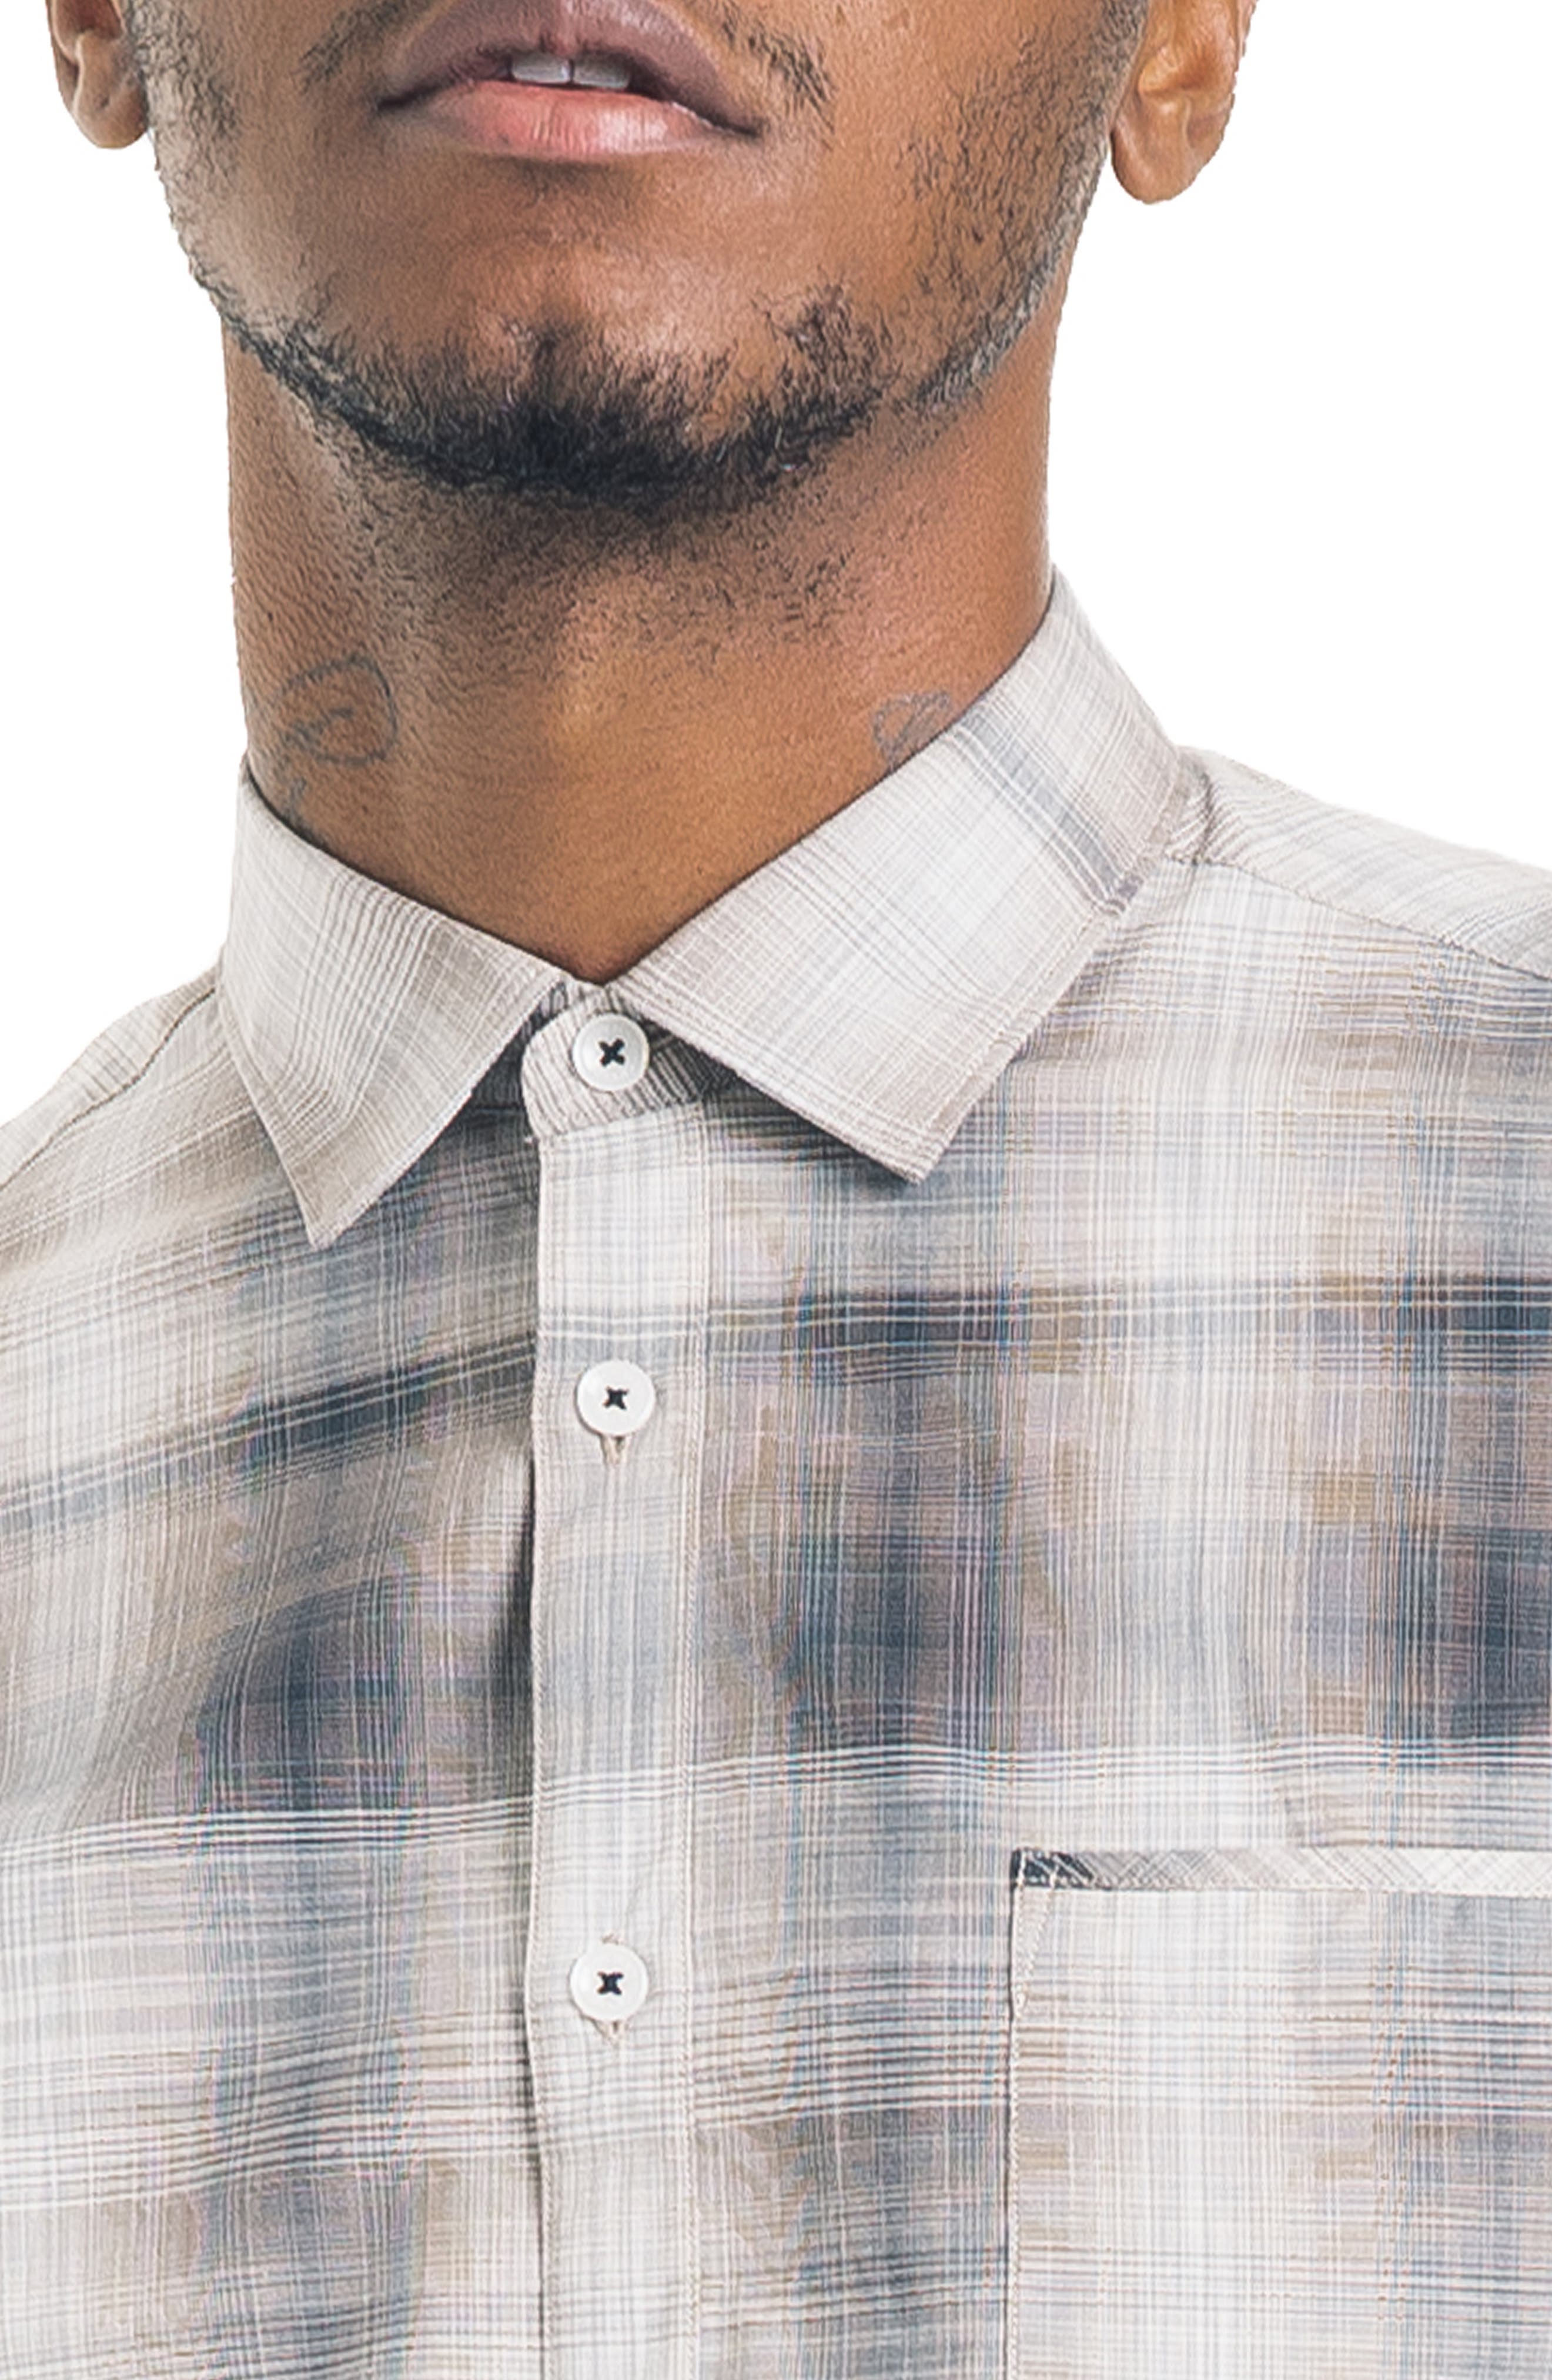 Hamachi Slim Fit Plaid Sport Shirt,                             Alternate thumbnail 4, color,                             DESERT